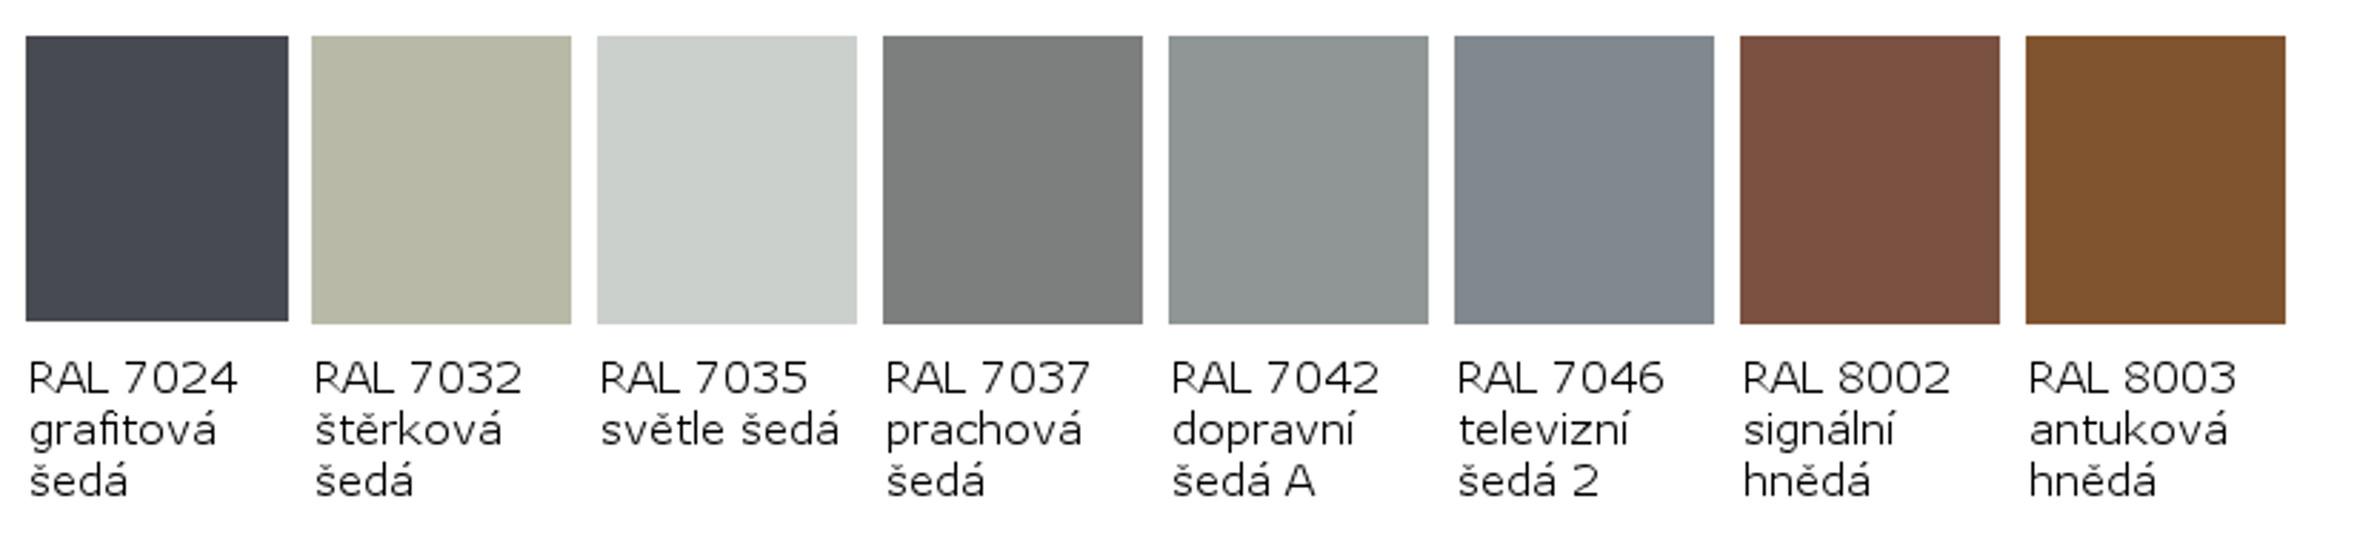 RAL 7024 - RAL 8003